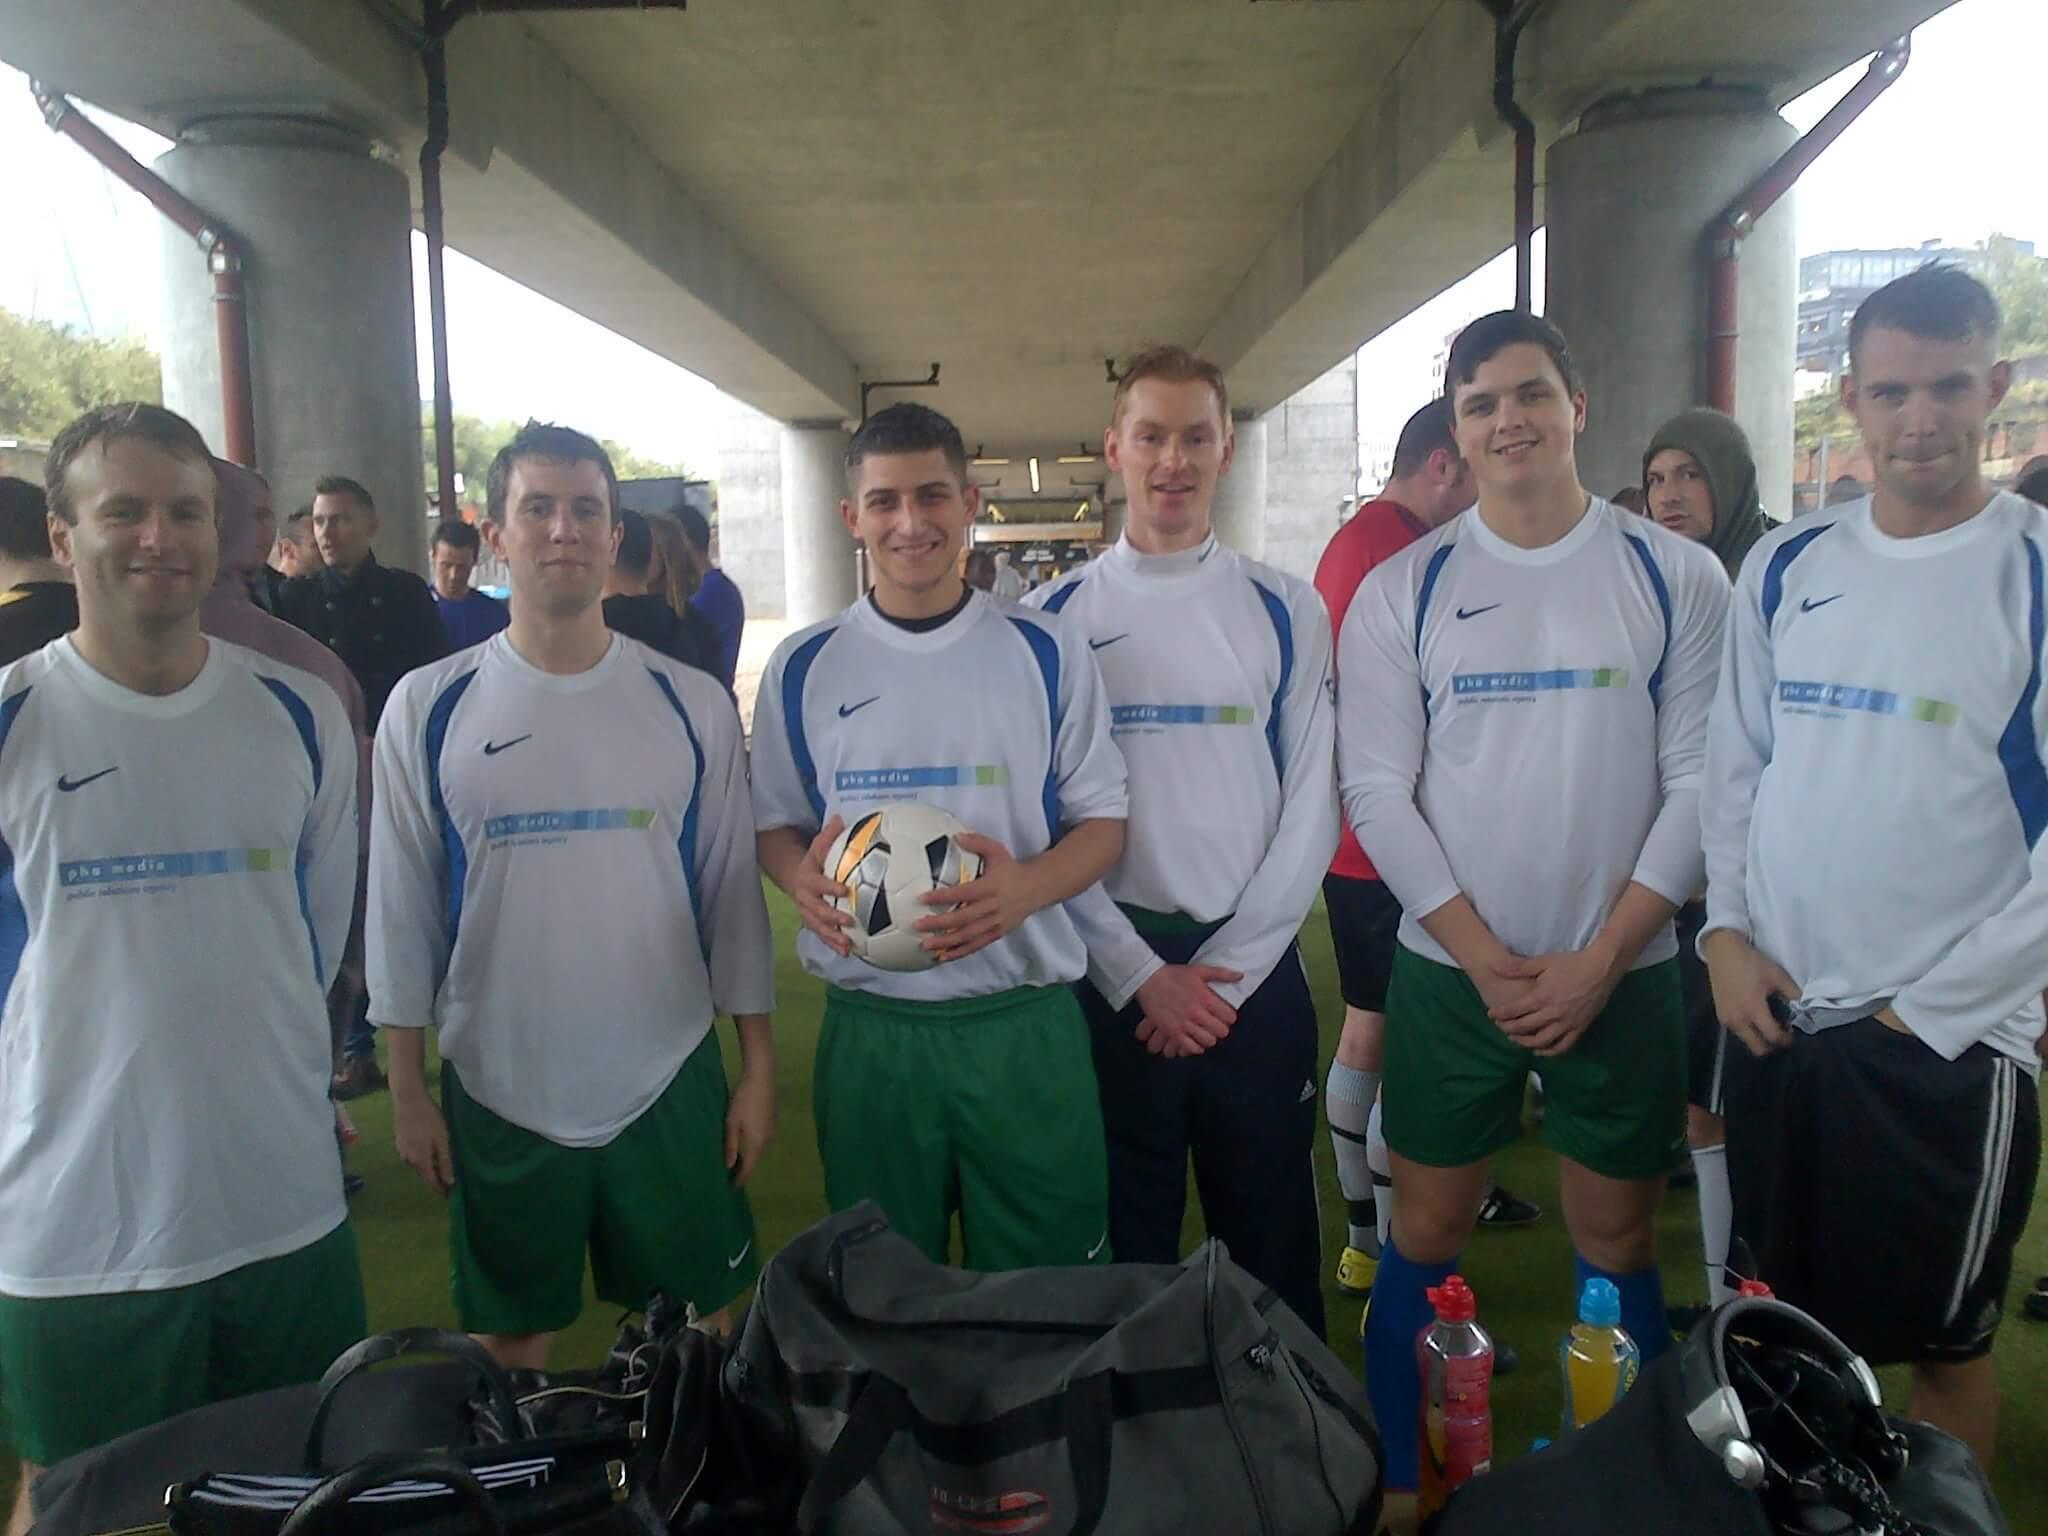 Team PHA try out 5 a side PowerLeague football